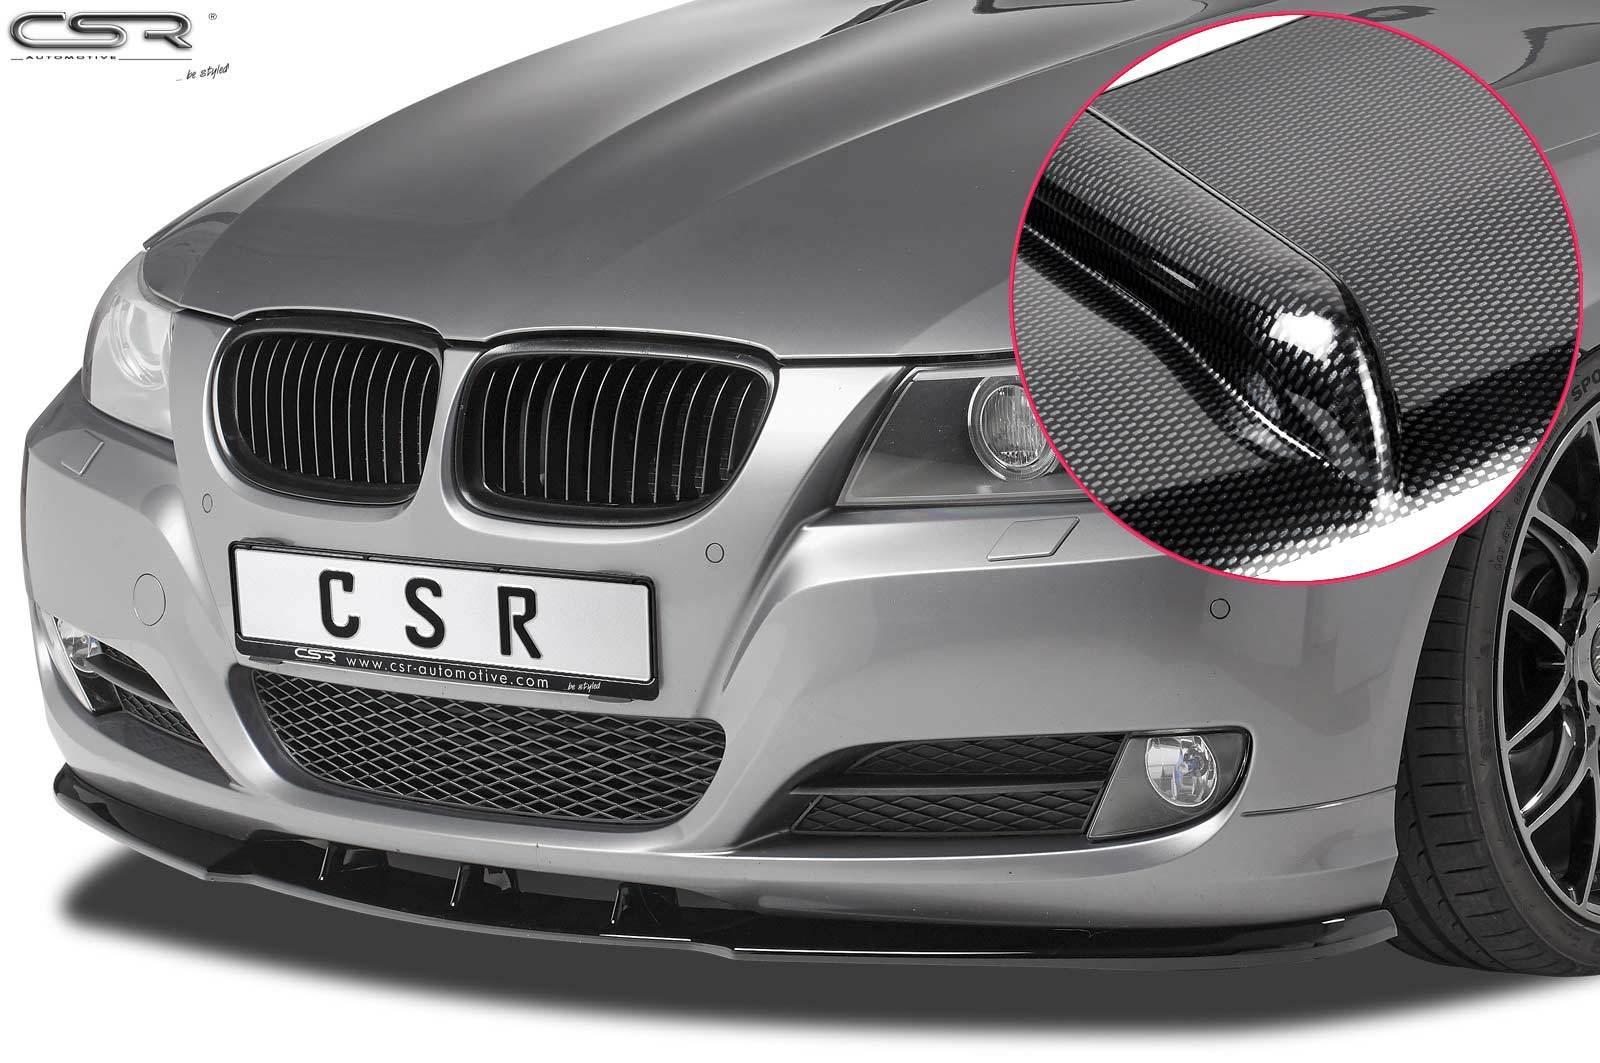 Cup-Spoilerlippe mit ABE für BMW E90 / E91 LCI CSL327-C